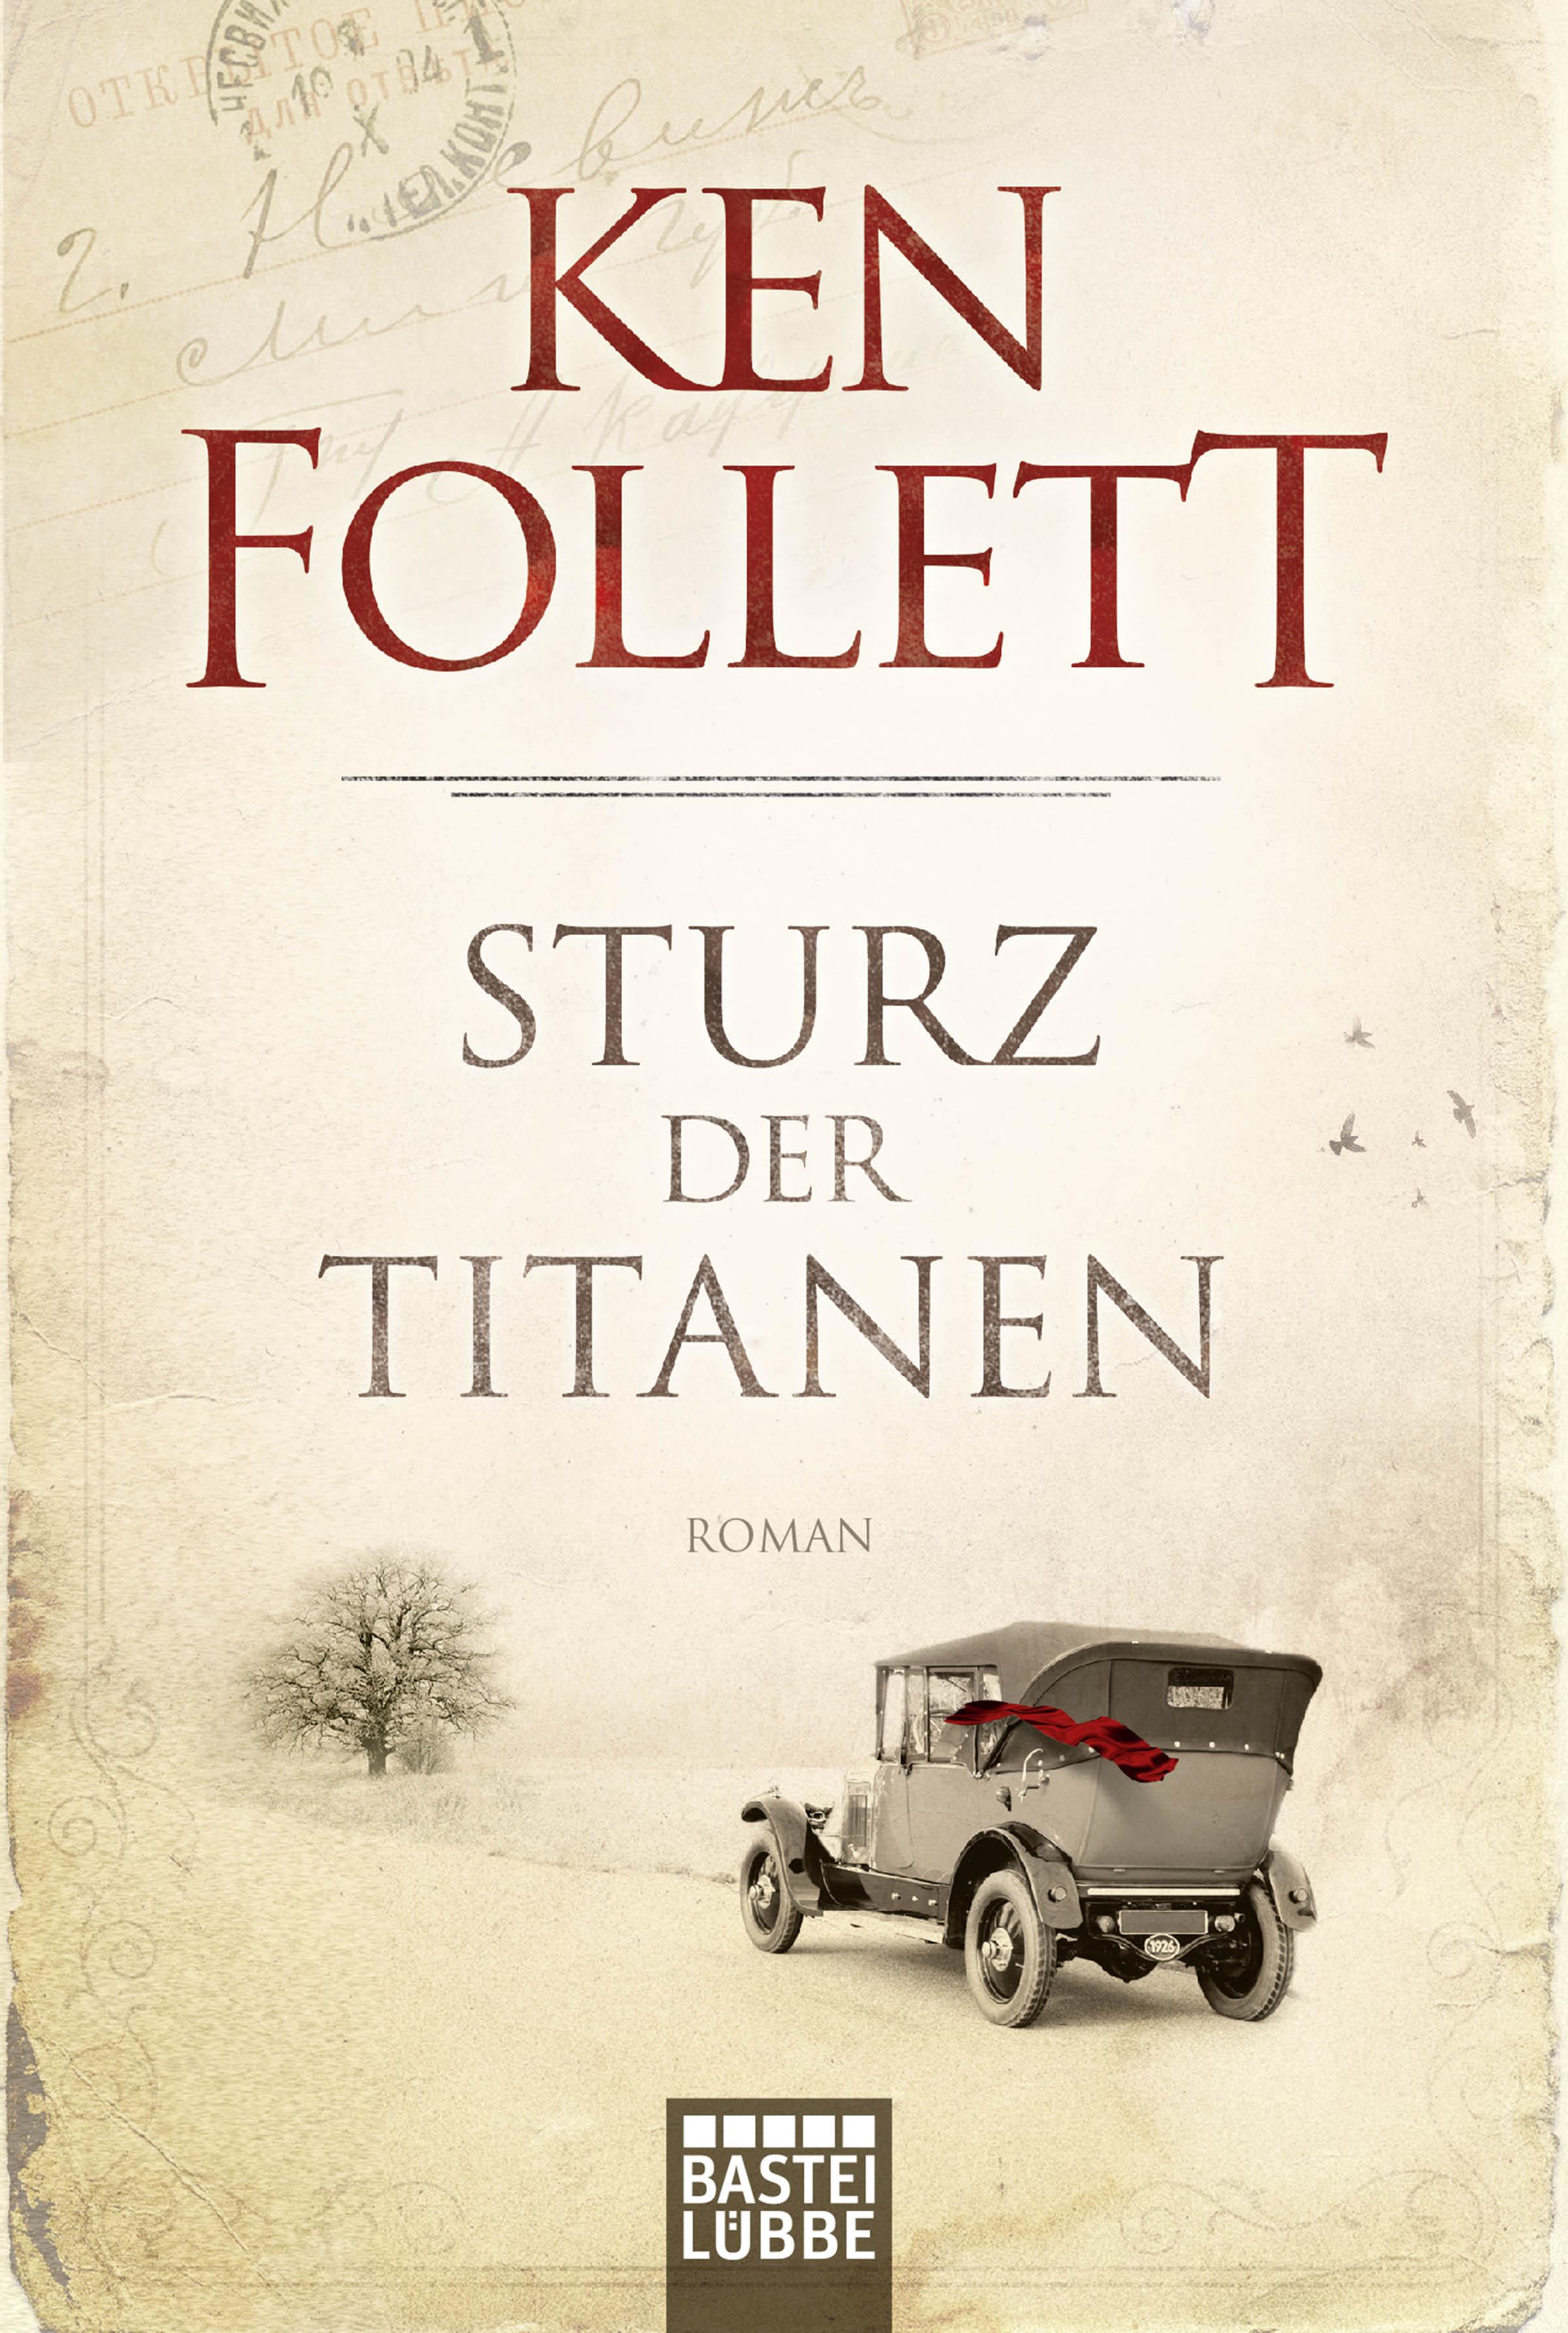 RZ_Follett_Titanen_Klappe.indd